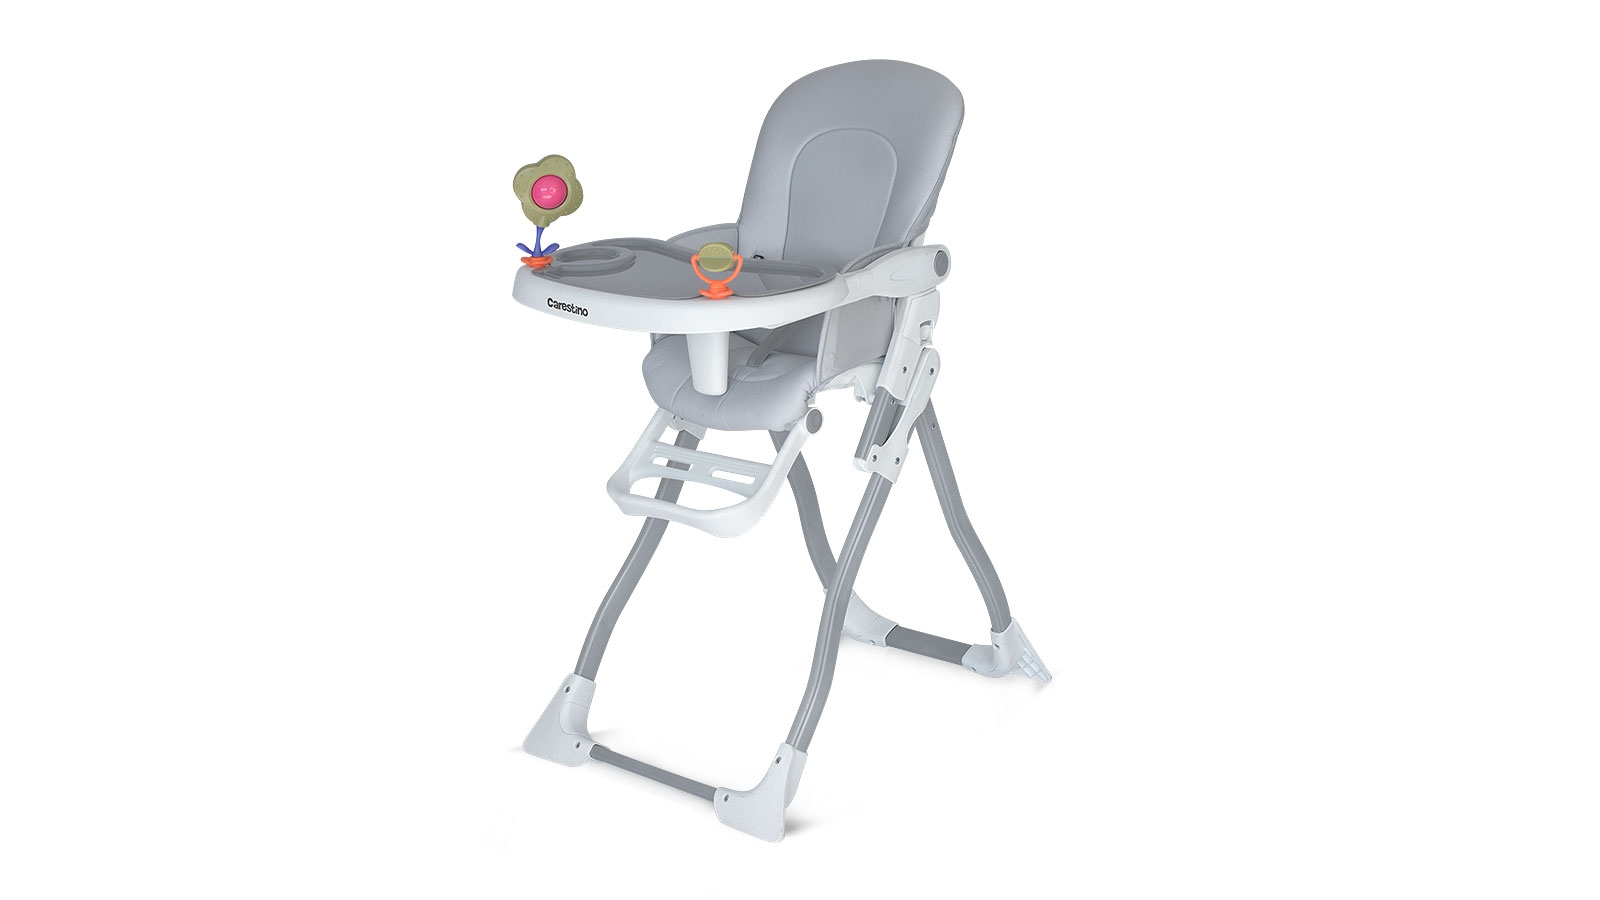 Carestino productos sillas sillas de comer silla for Sillas en gris